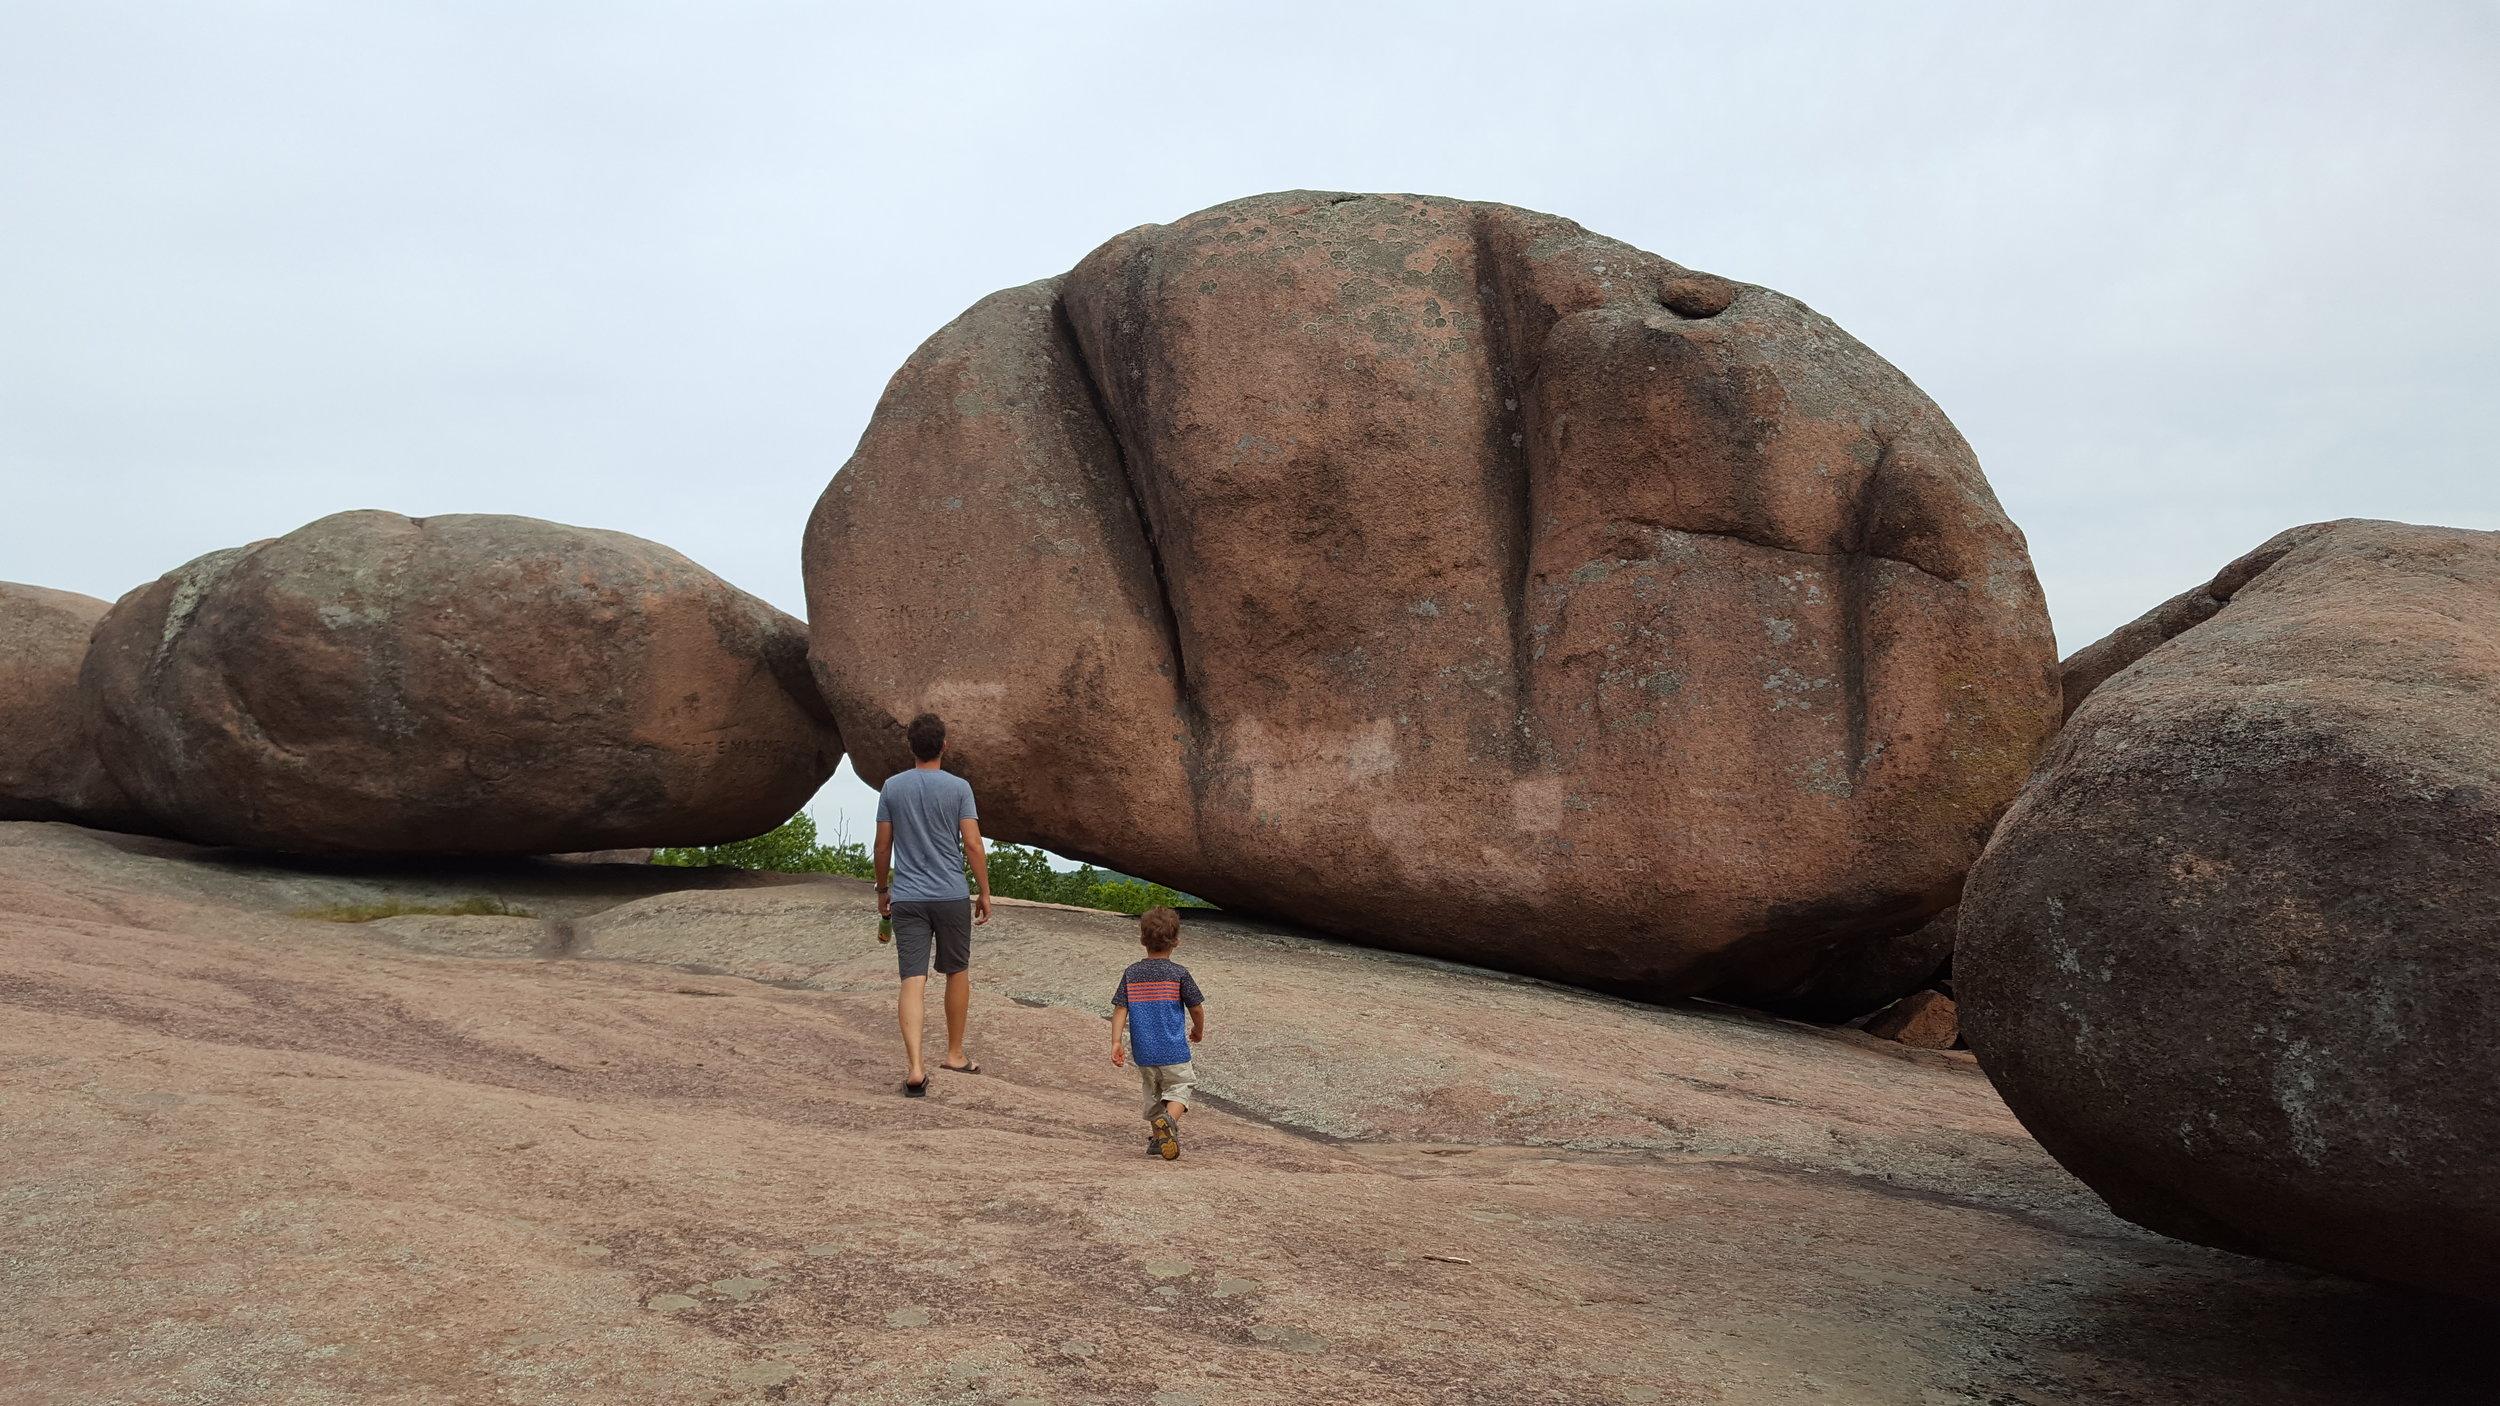 Elephant Rocks State Park in Missouri -After a nice twenty minute hike we located the behemoth rocks!